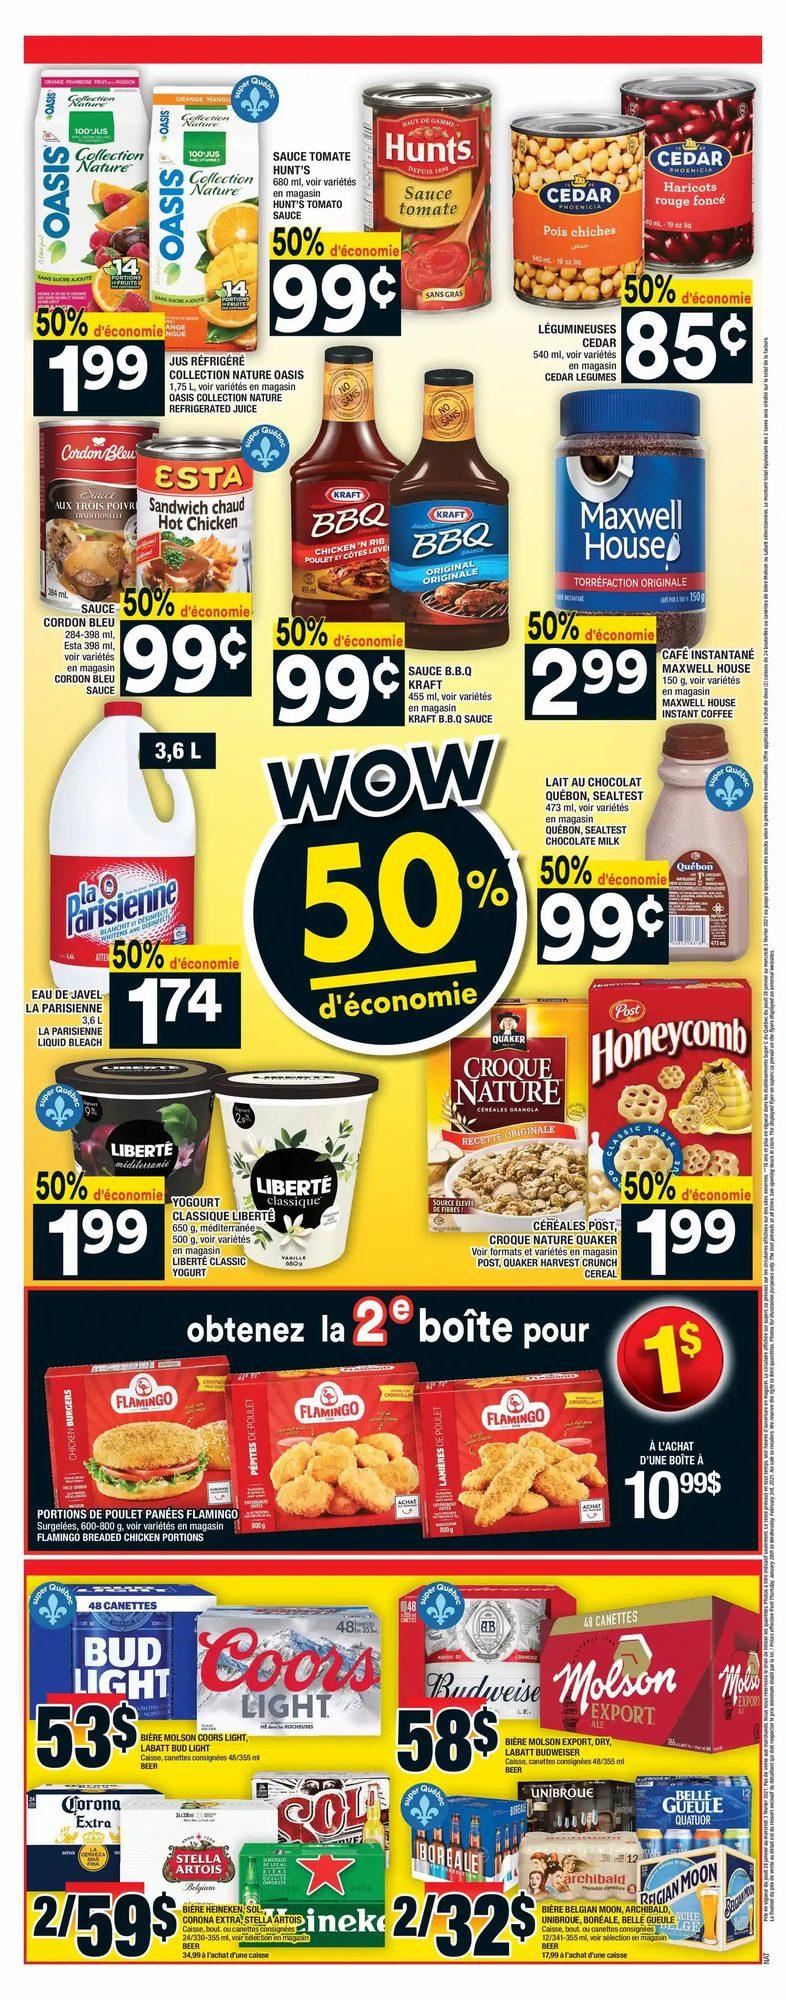 Super C - Weekly Flyer Specials - Page 4